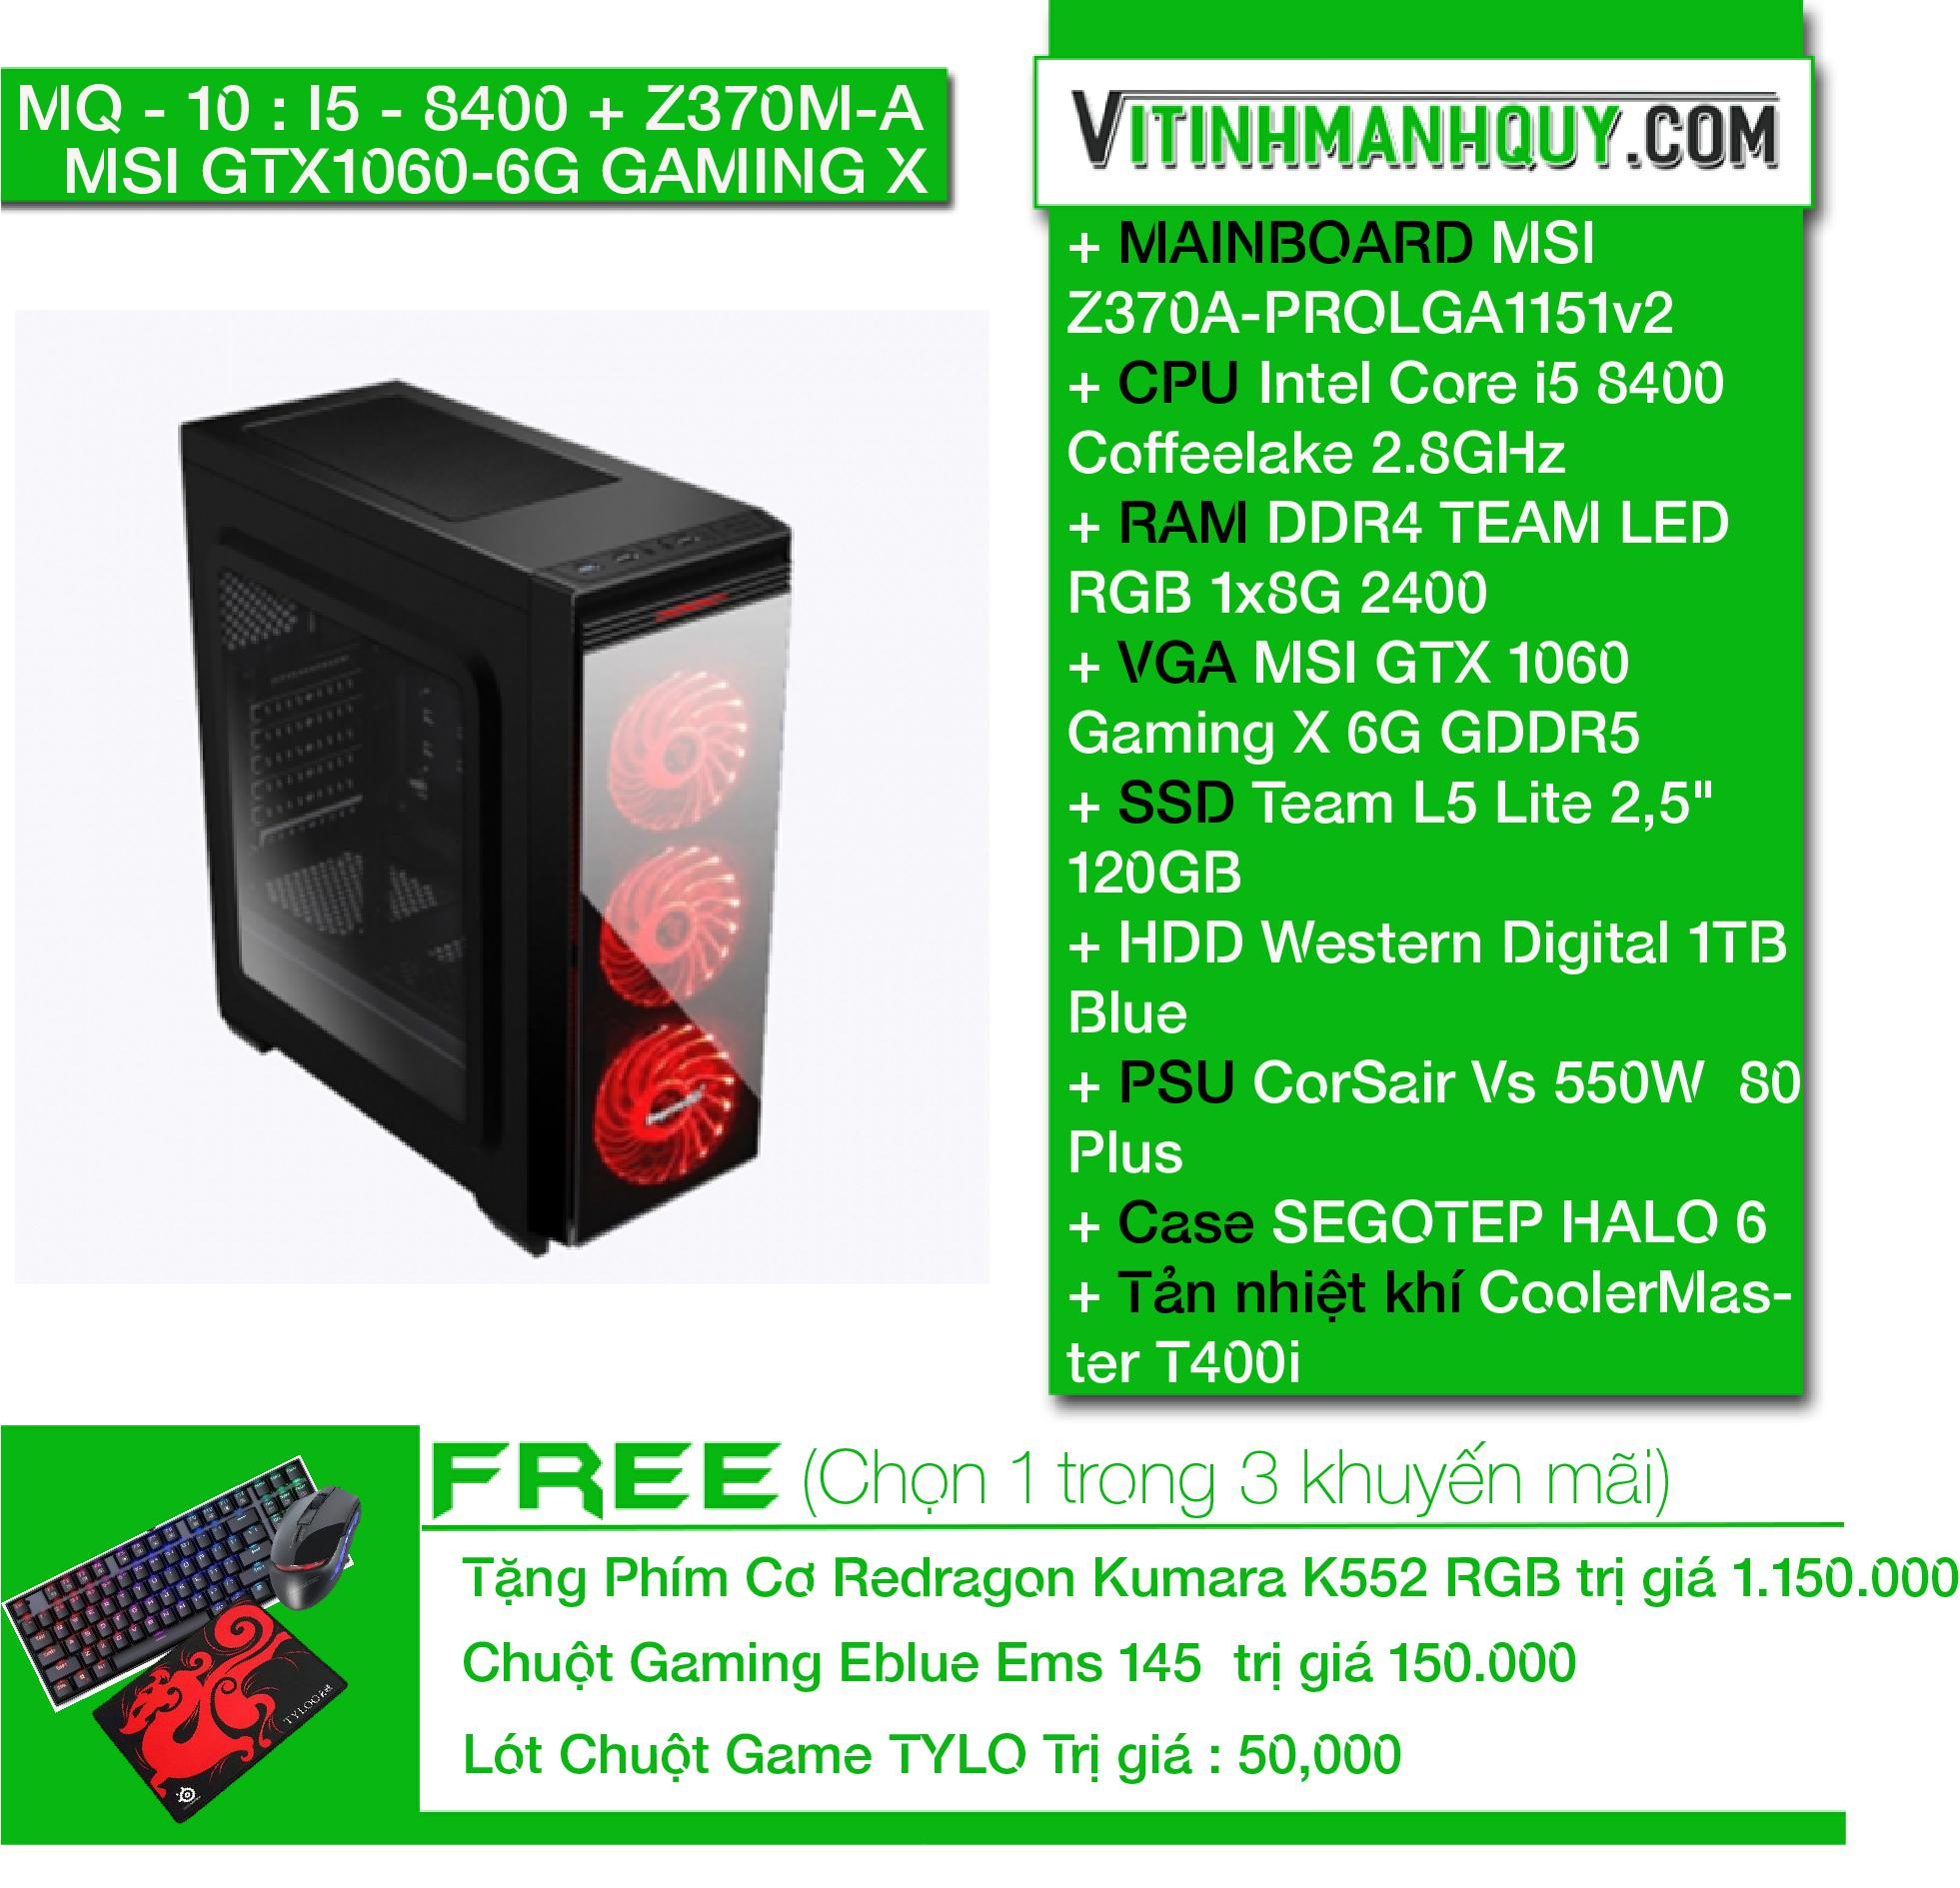 Hình ảnh MQ10I58400 + Z370M-A + MSI GTX1060 -6G GAMINGX - CaseSEGOTEP HALO 6- Intel Corei5 8400Coffeelake 2.8GHz - DDR4TEAM LED RGB1x8G2400 - SSD Team L5 Lite 2,5